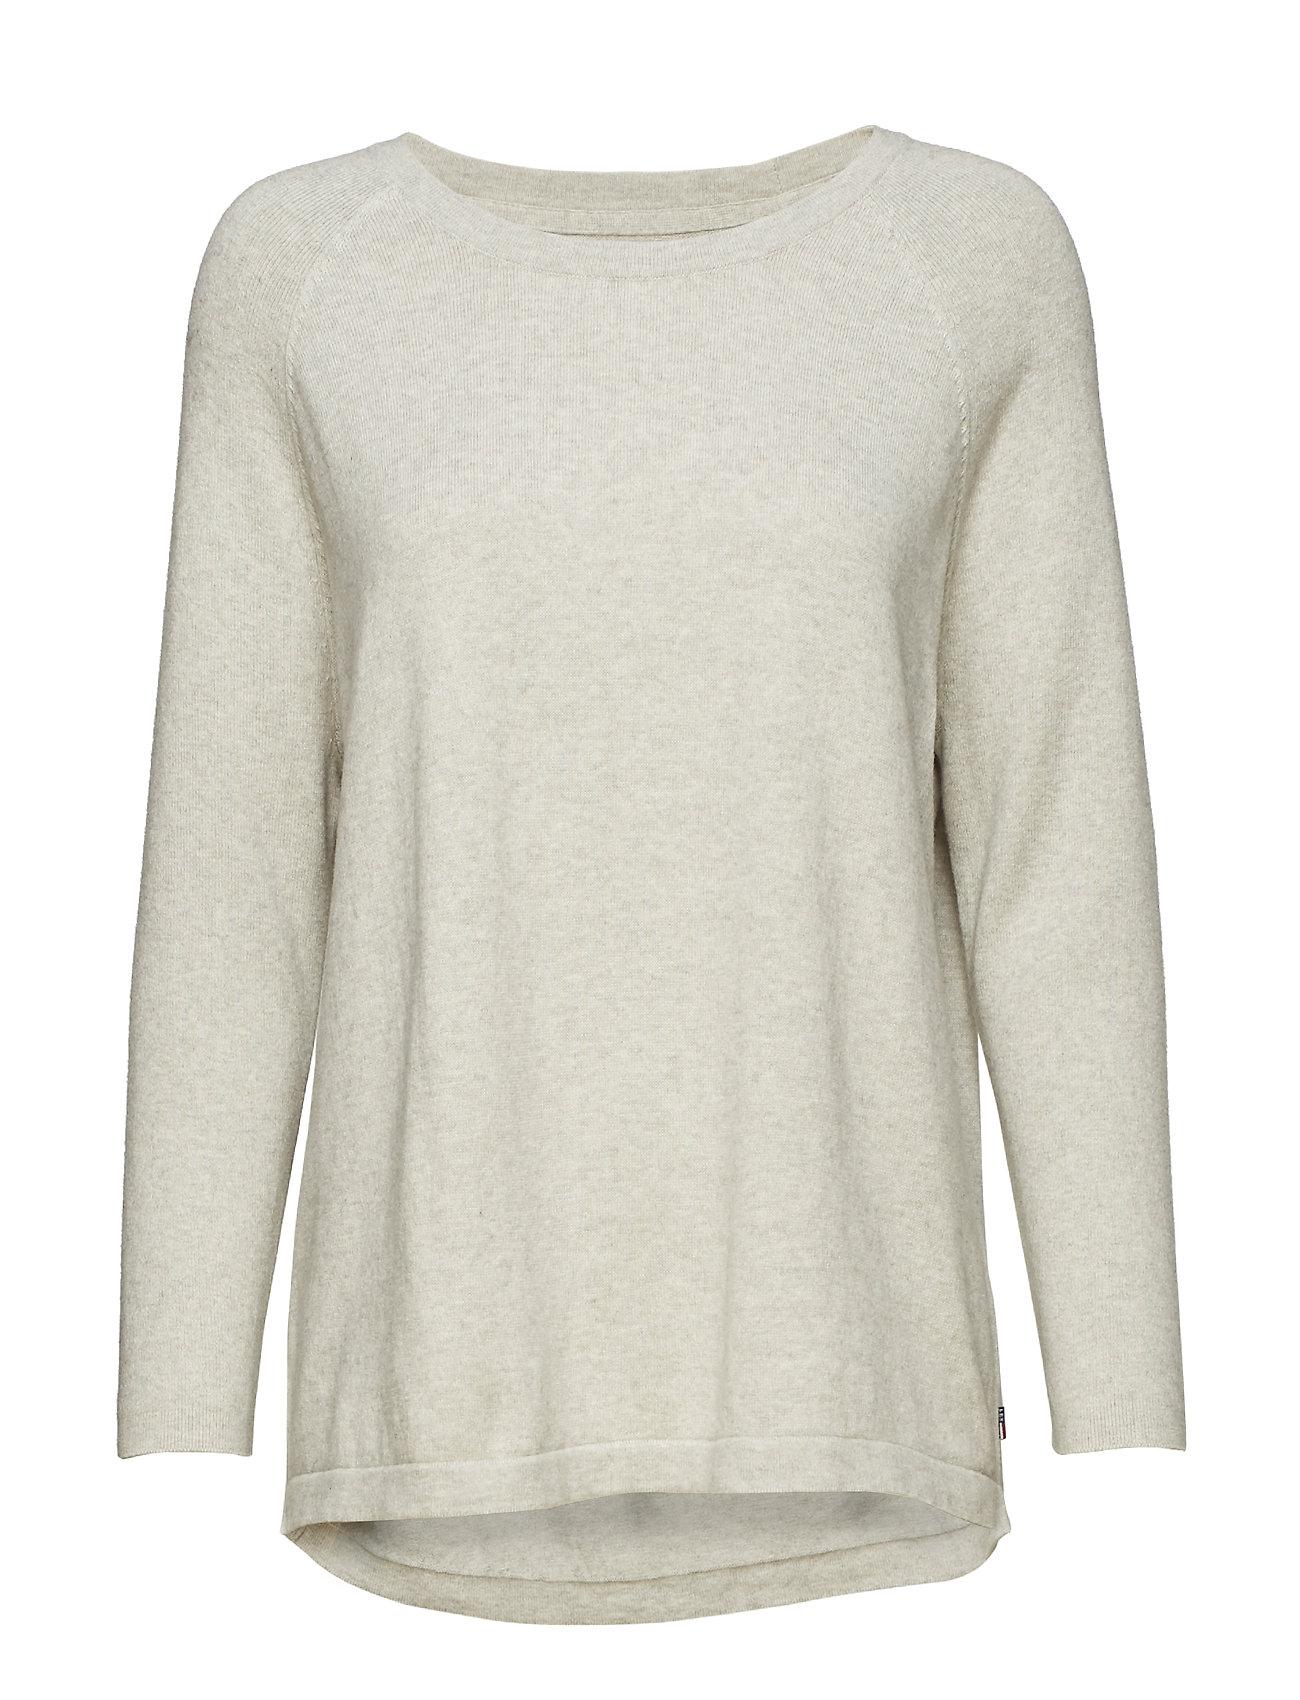 MelangeLexington Gray Sweaterlt Lea Clothing Warm 34A5RjqLc